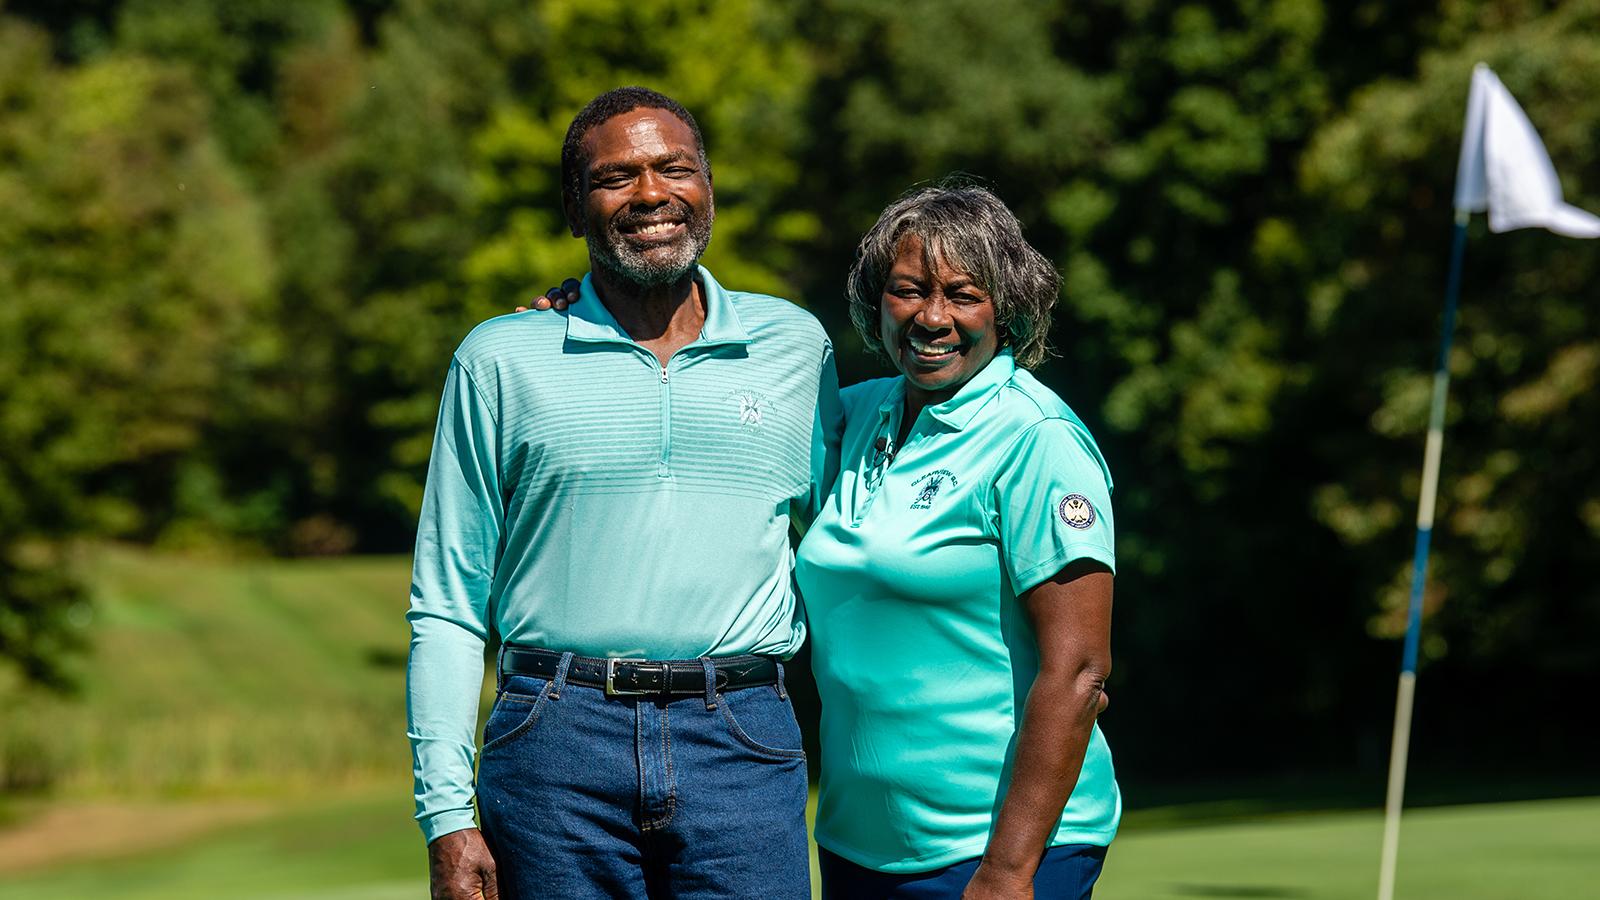 Larry and Renee Powell, PGA